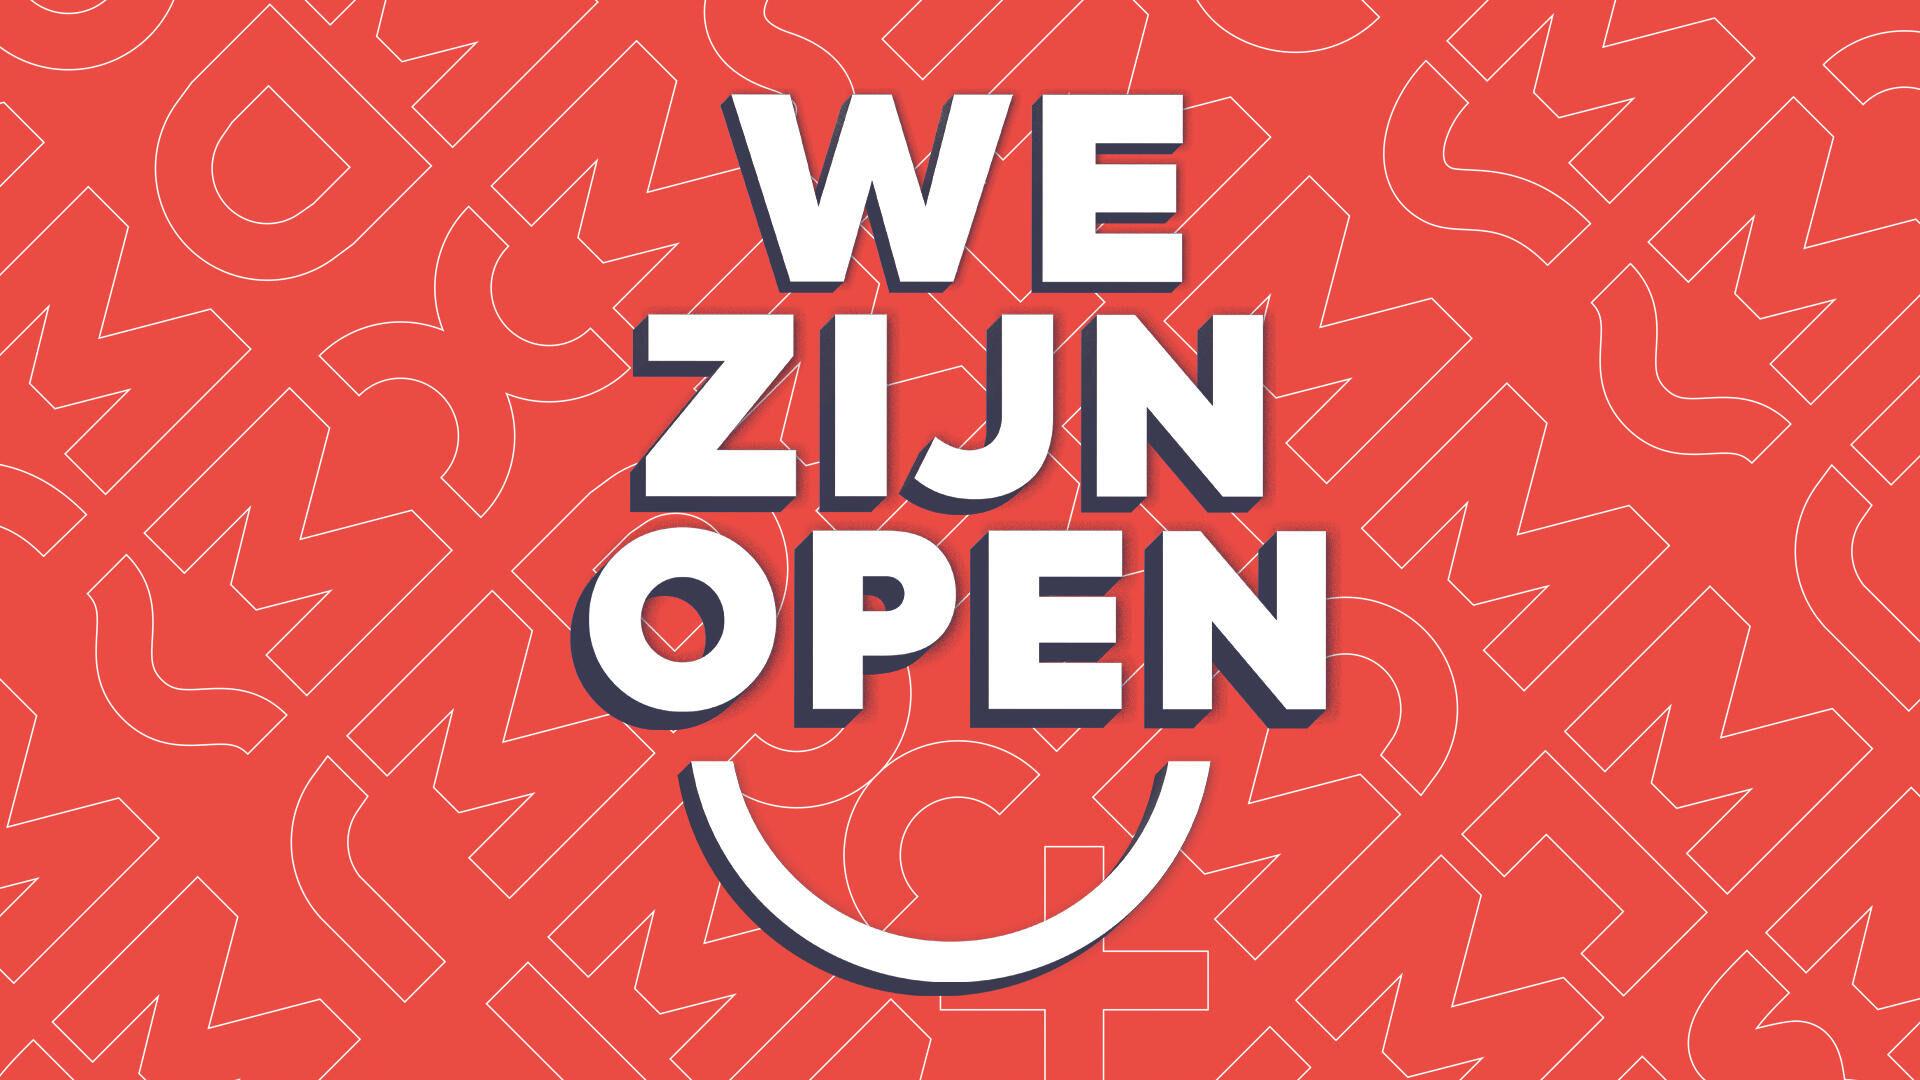 MIMIK is open